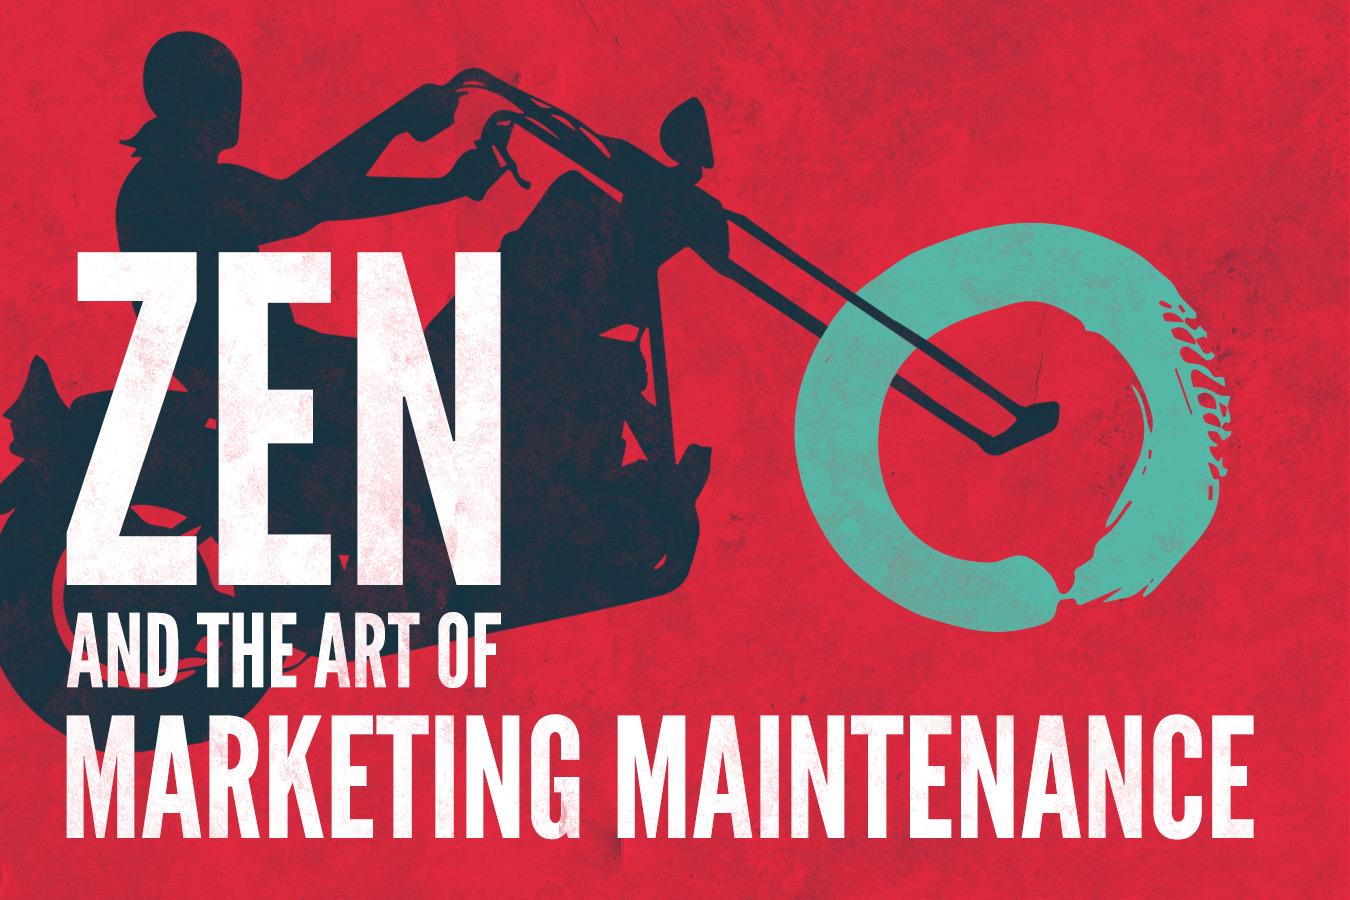 Zen and the Art of Marketing Maintenance